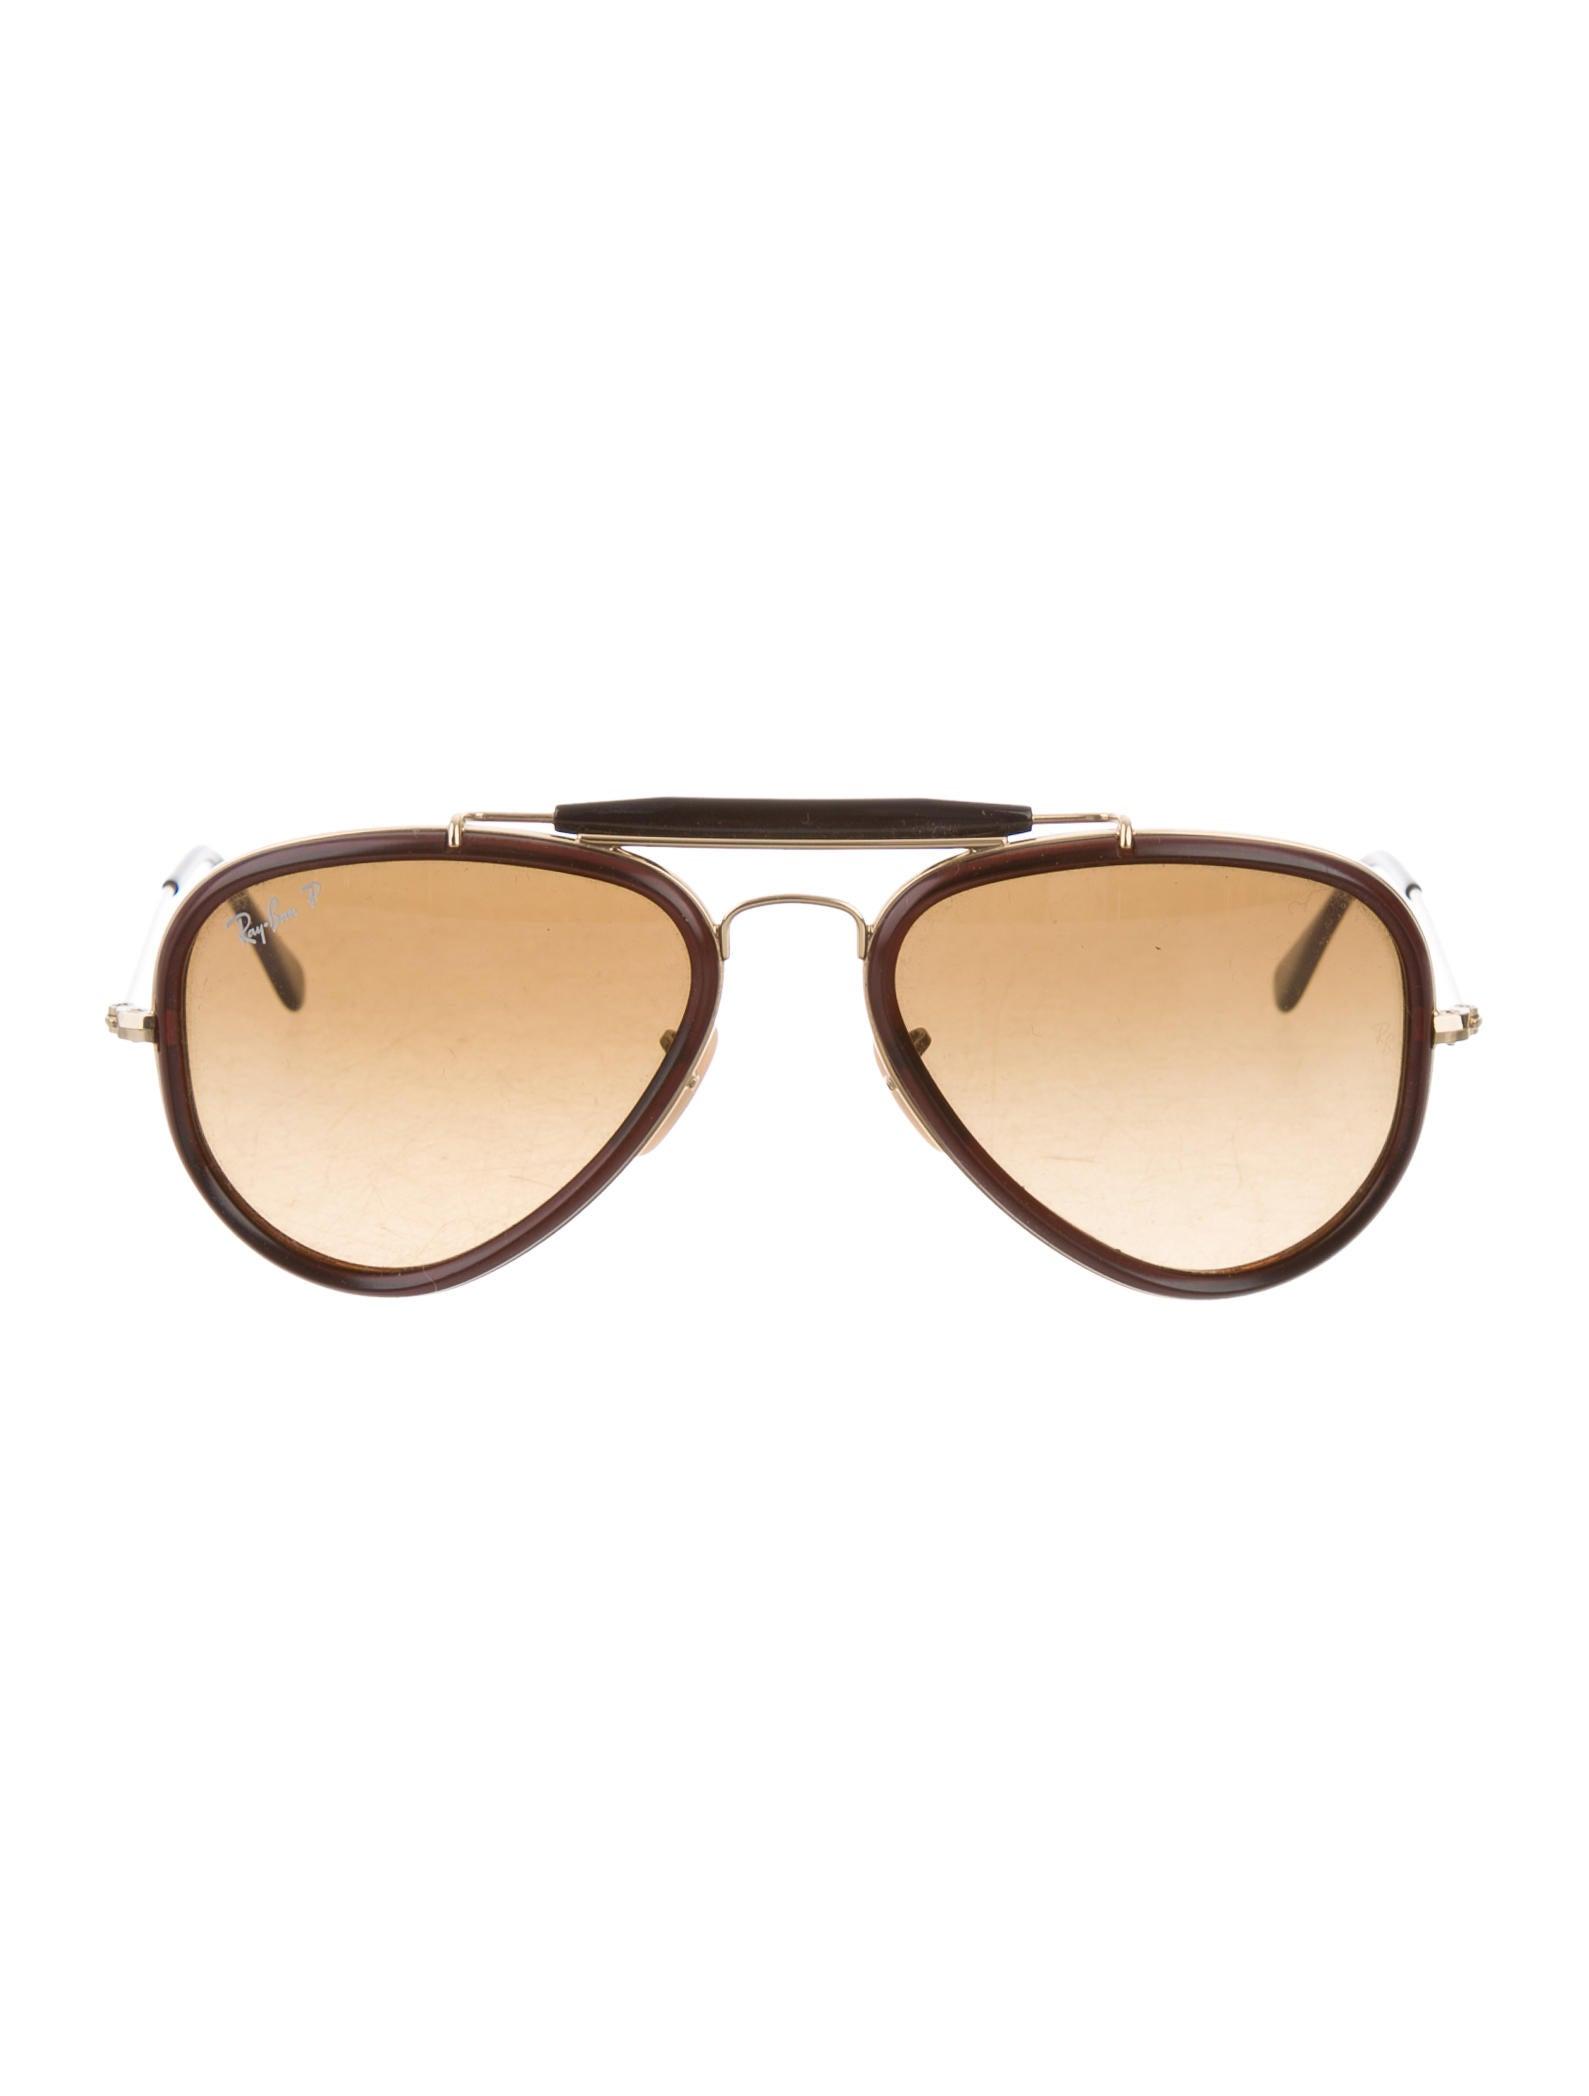 8dd92ec490 Ray-Ban Road Spirit Aviator Sunglasses - Accessories - WRX26344